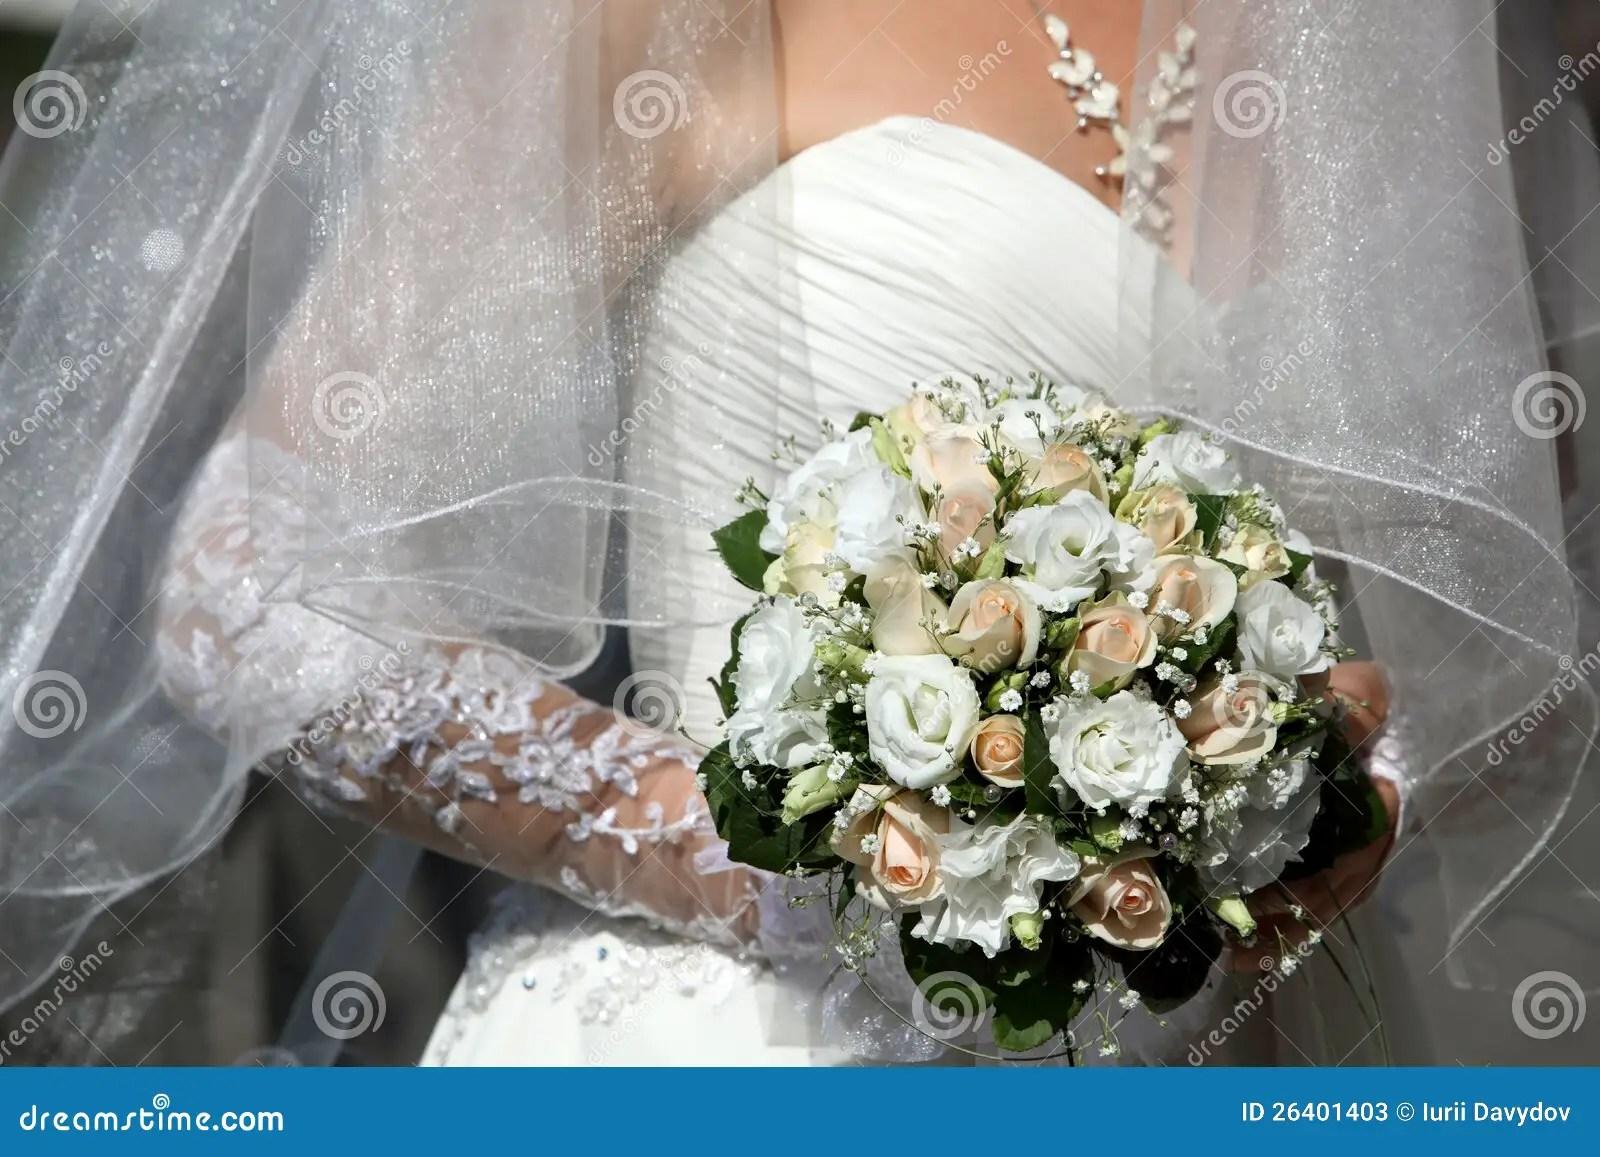 Bride Holding Beautiful Wedding Flowers Bouquet Stock